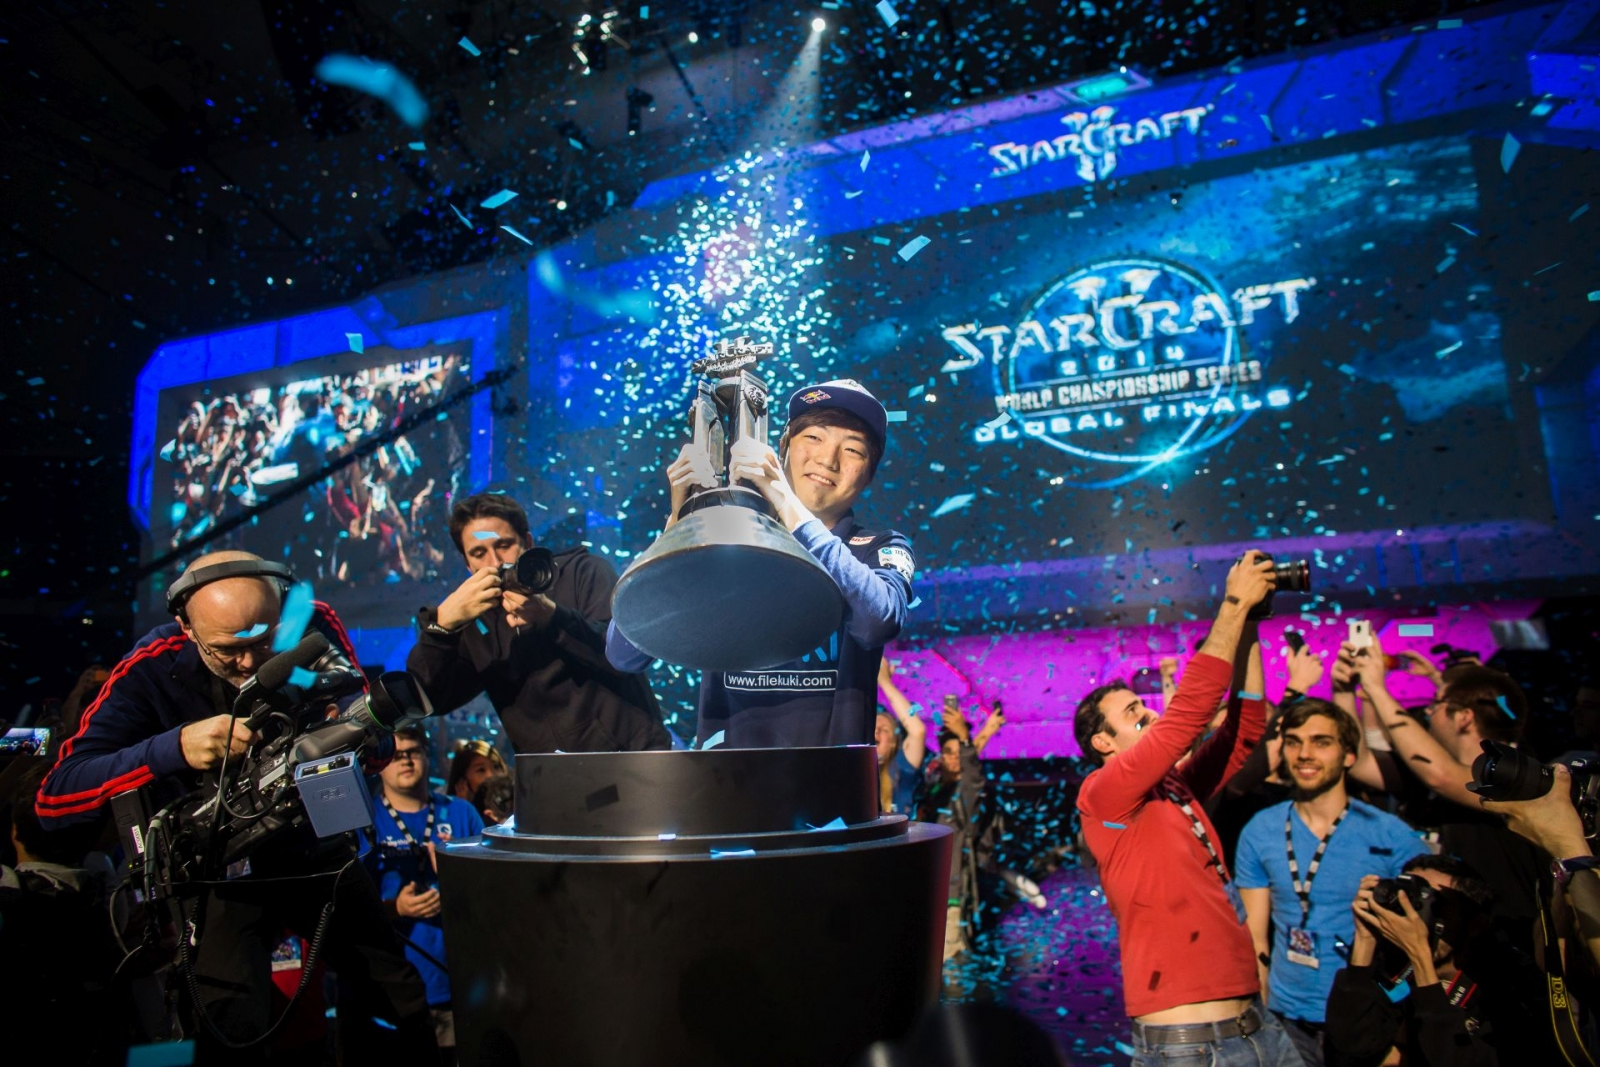 Starcraft 2 World Championship Series 2014 champion Lee 'Life' Seung Hyun celebrates his victory